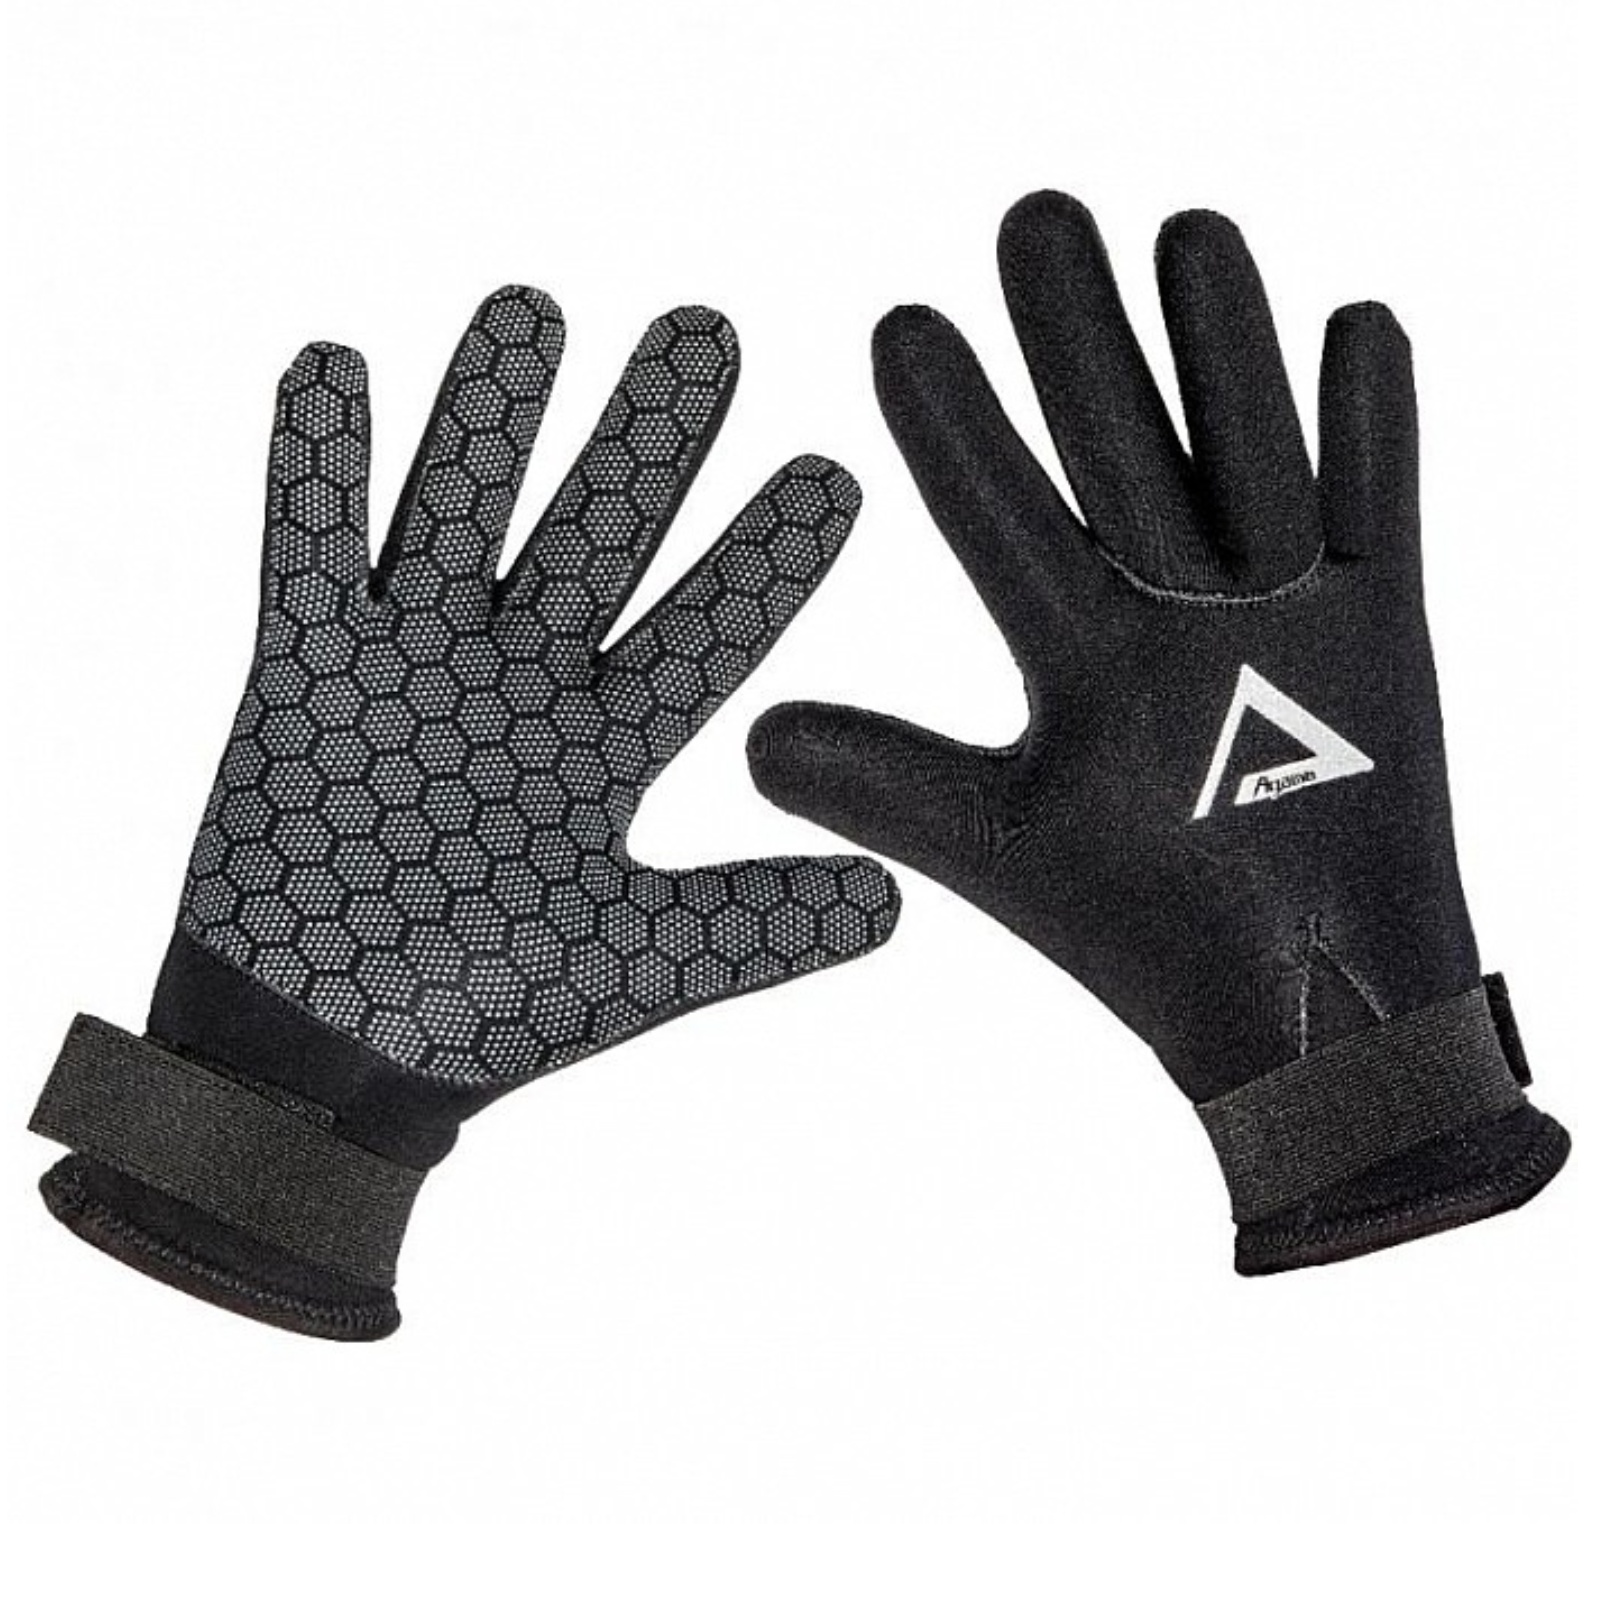 Neoprenové rukavice AGAMA Superstretch 5 mm - vel. XXL